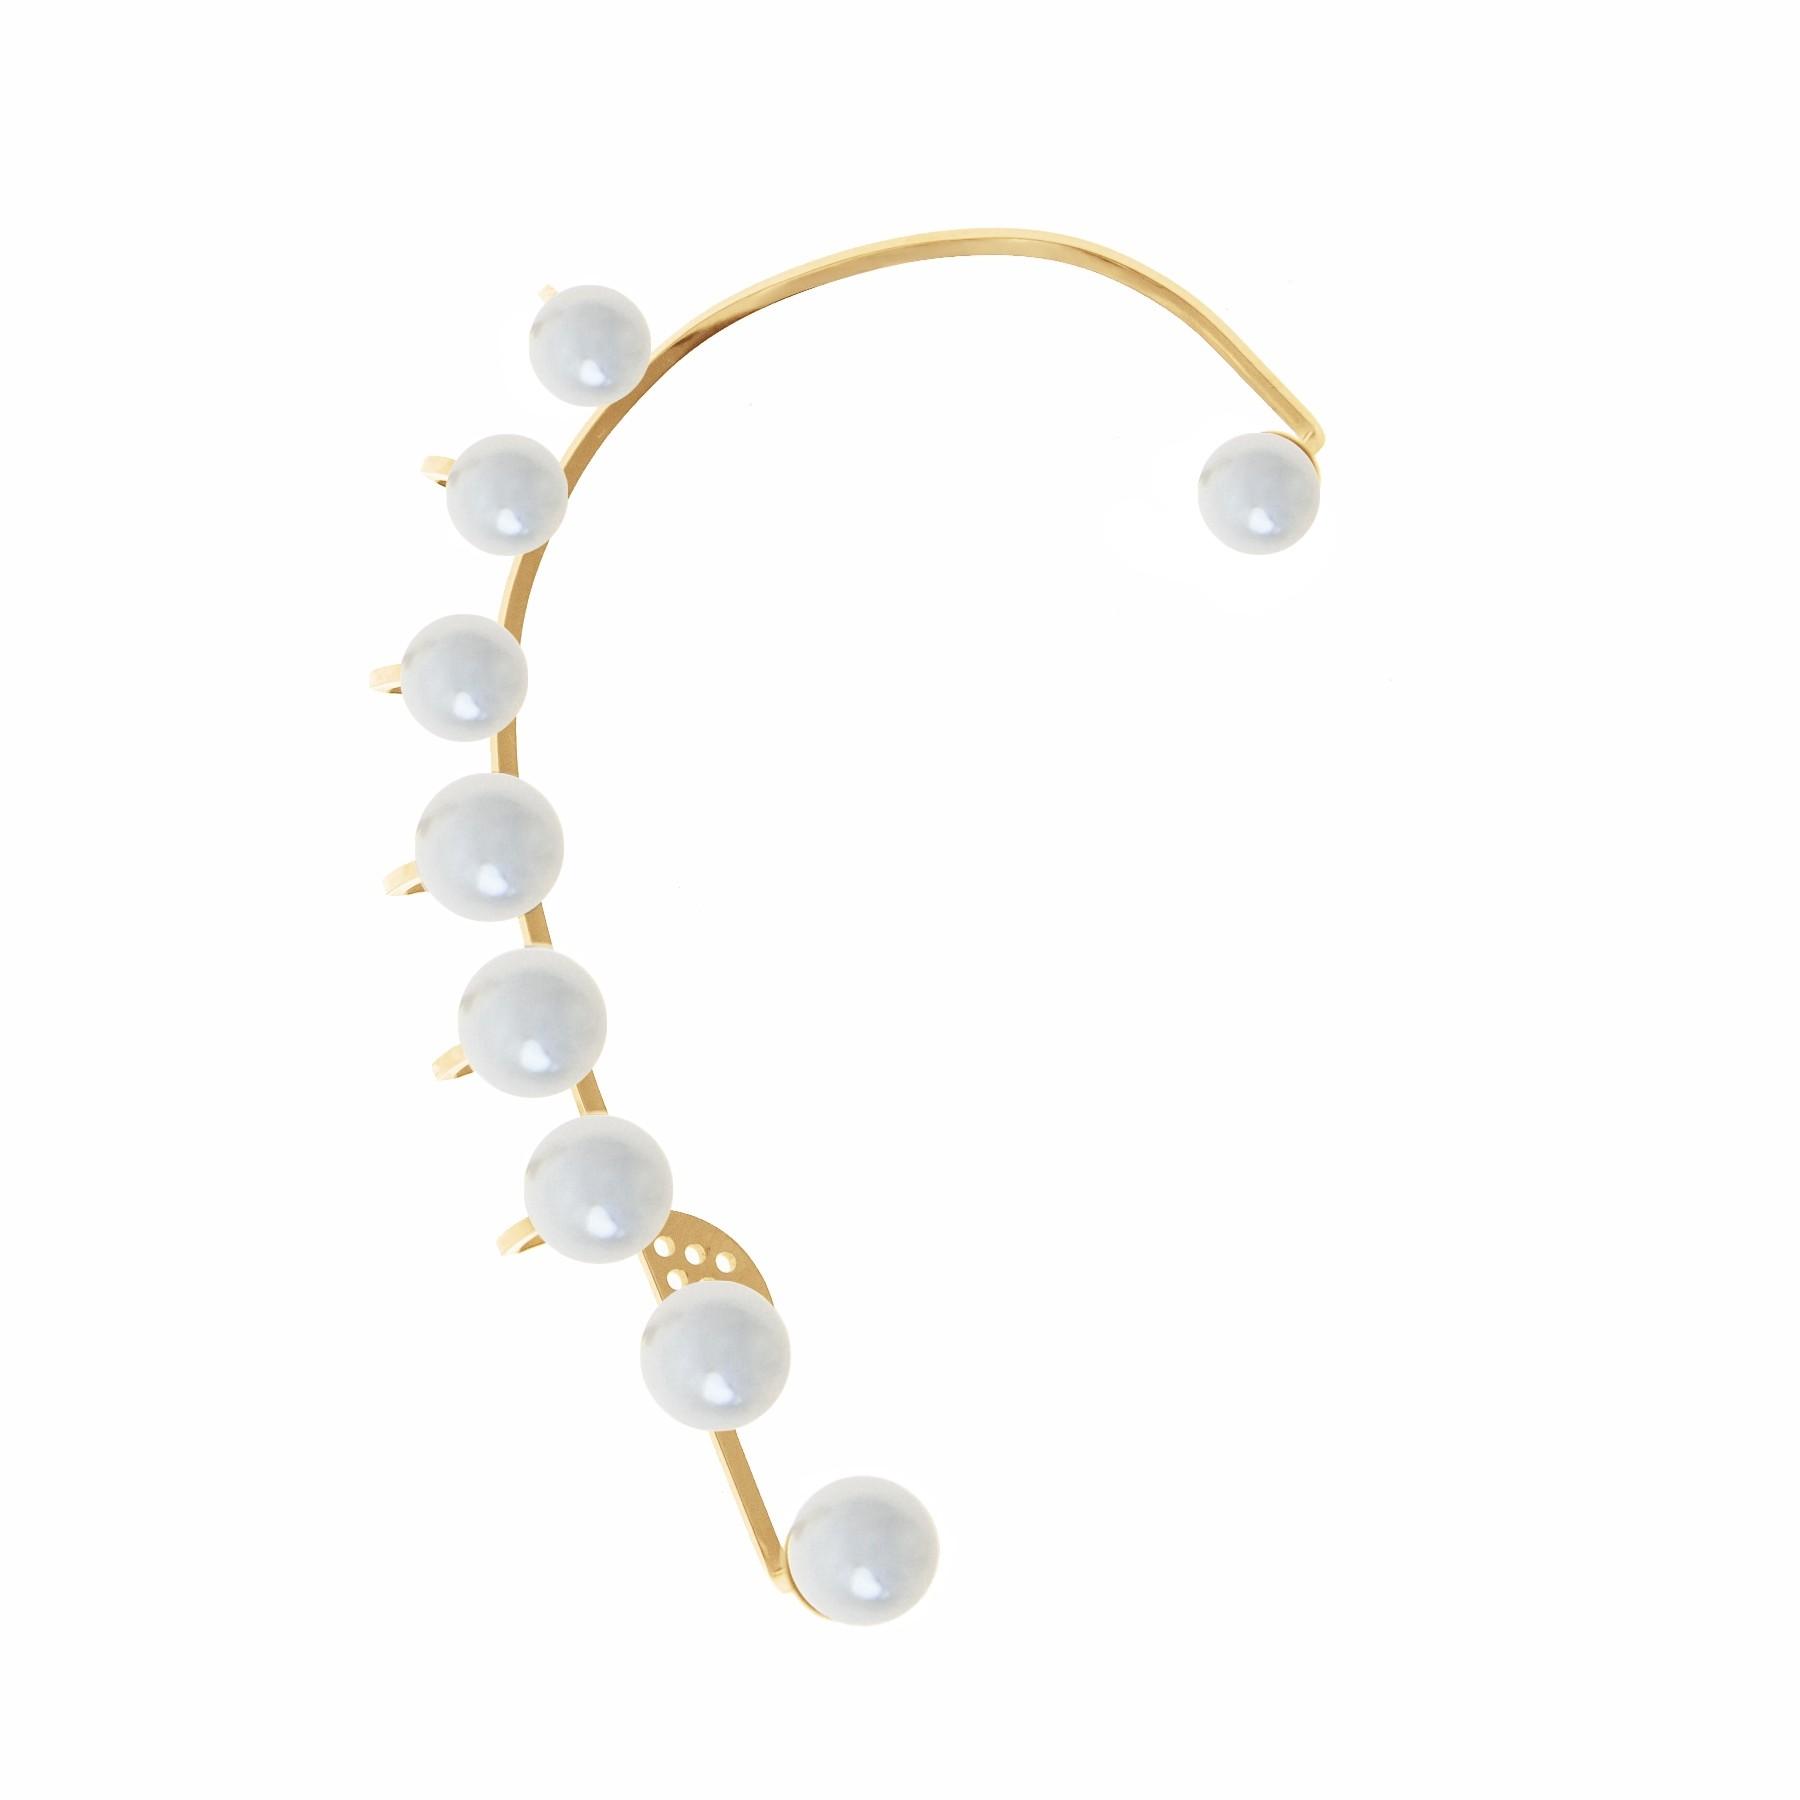 Ear cuff Pearls - droit,  plaqué or